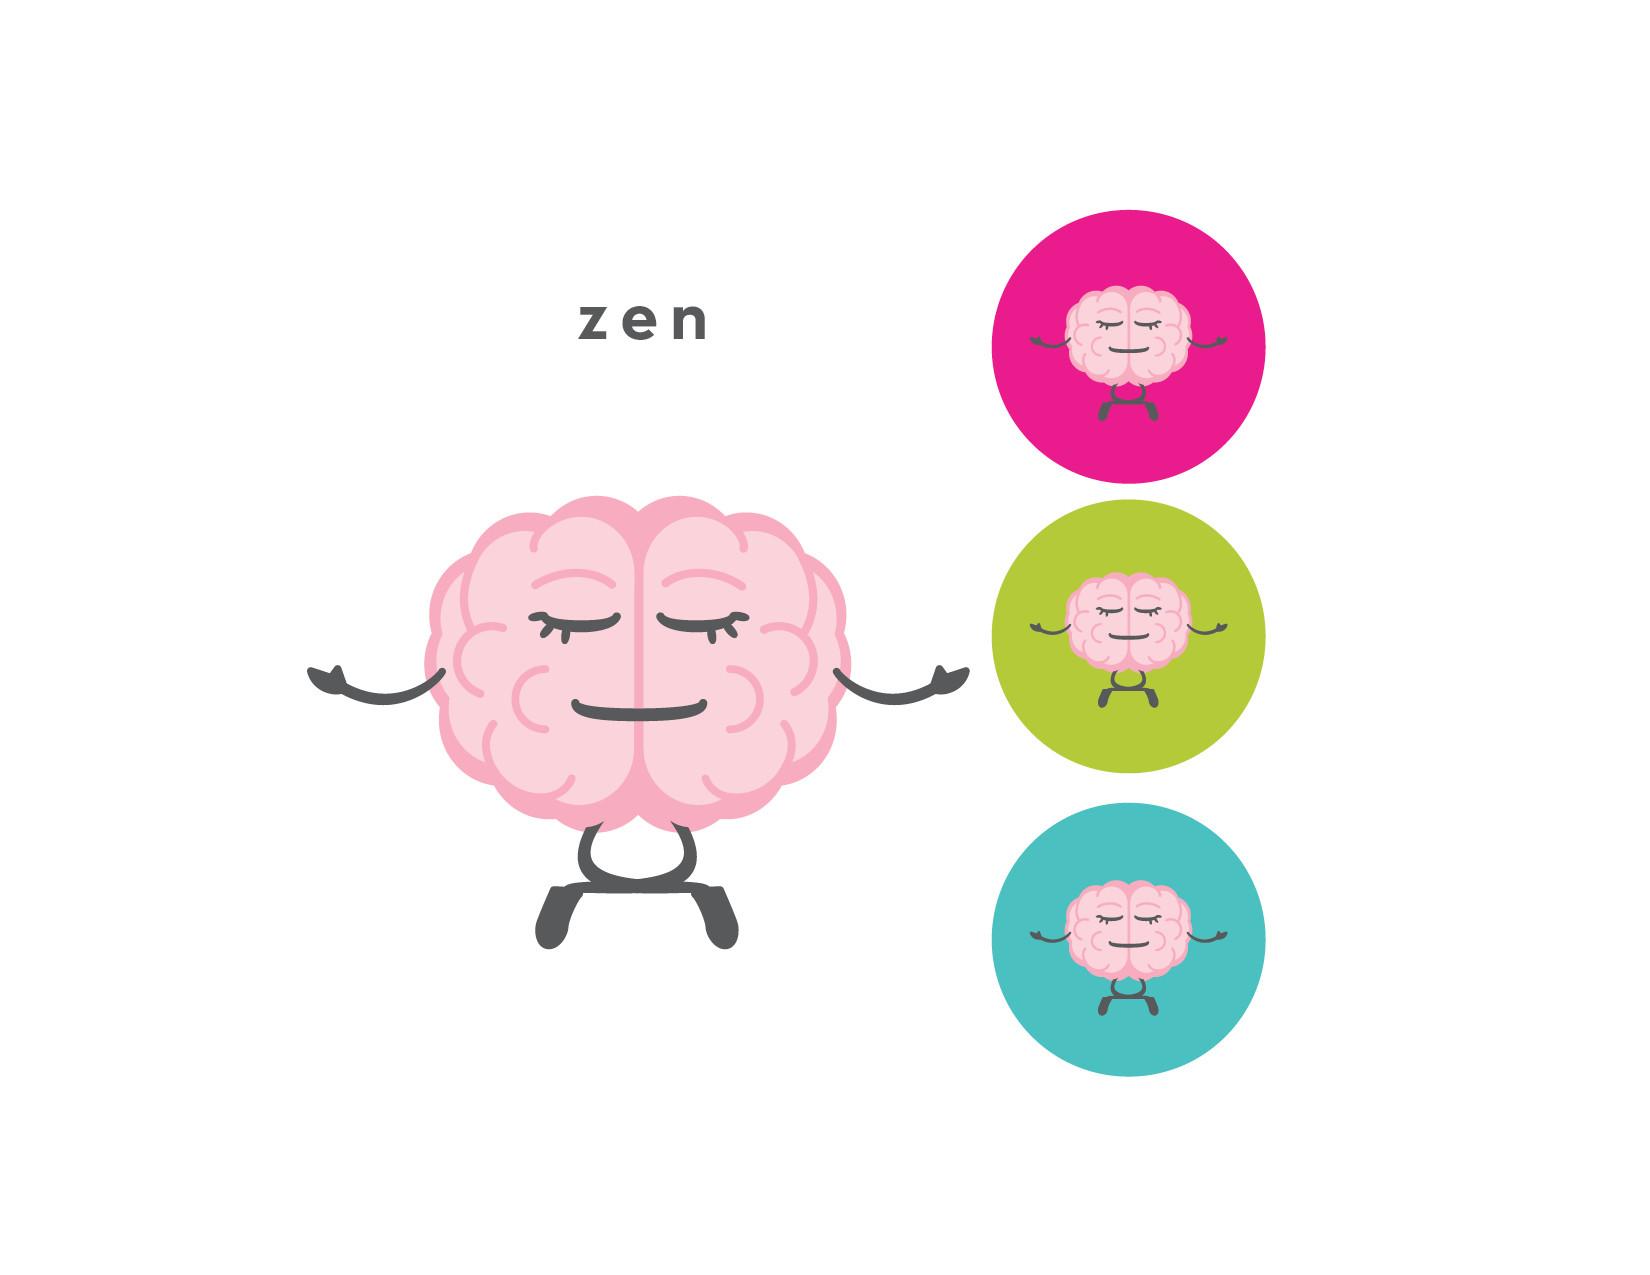 The CogniDiet Zen Brain Illustration